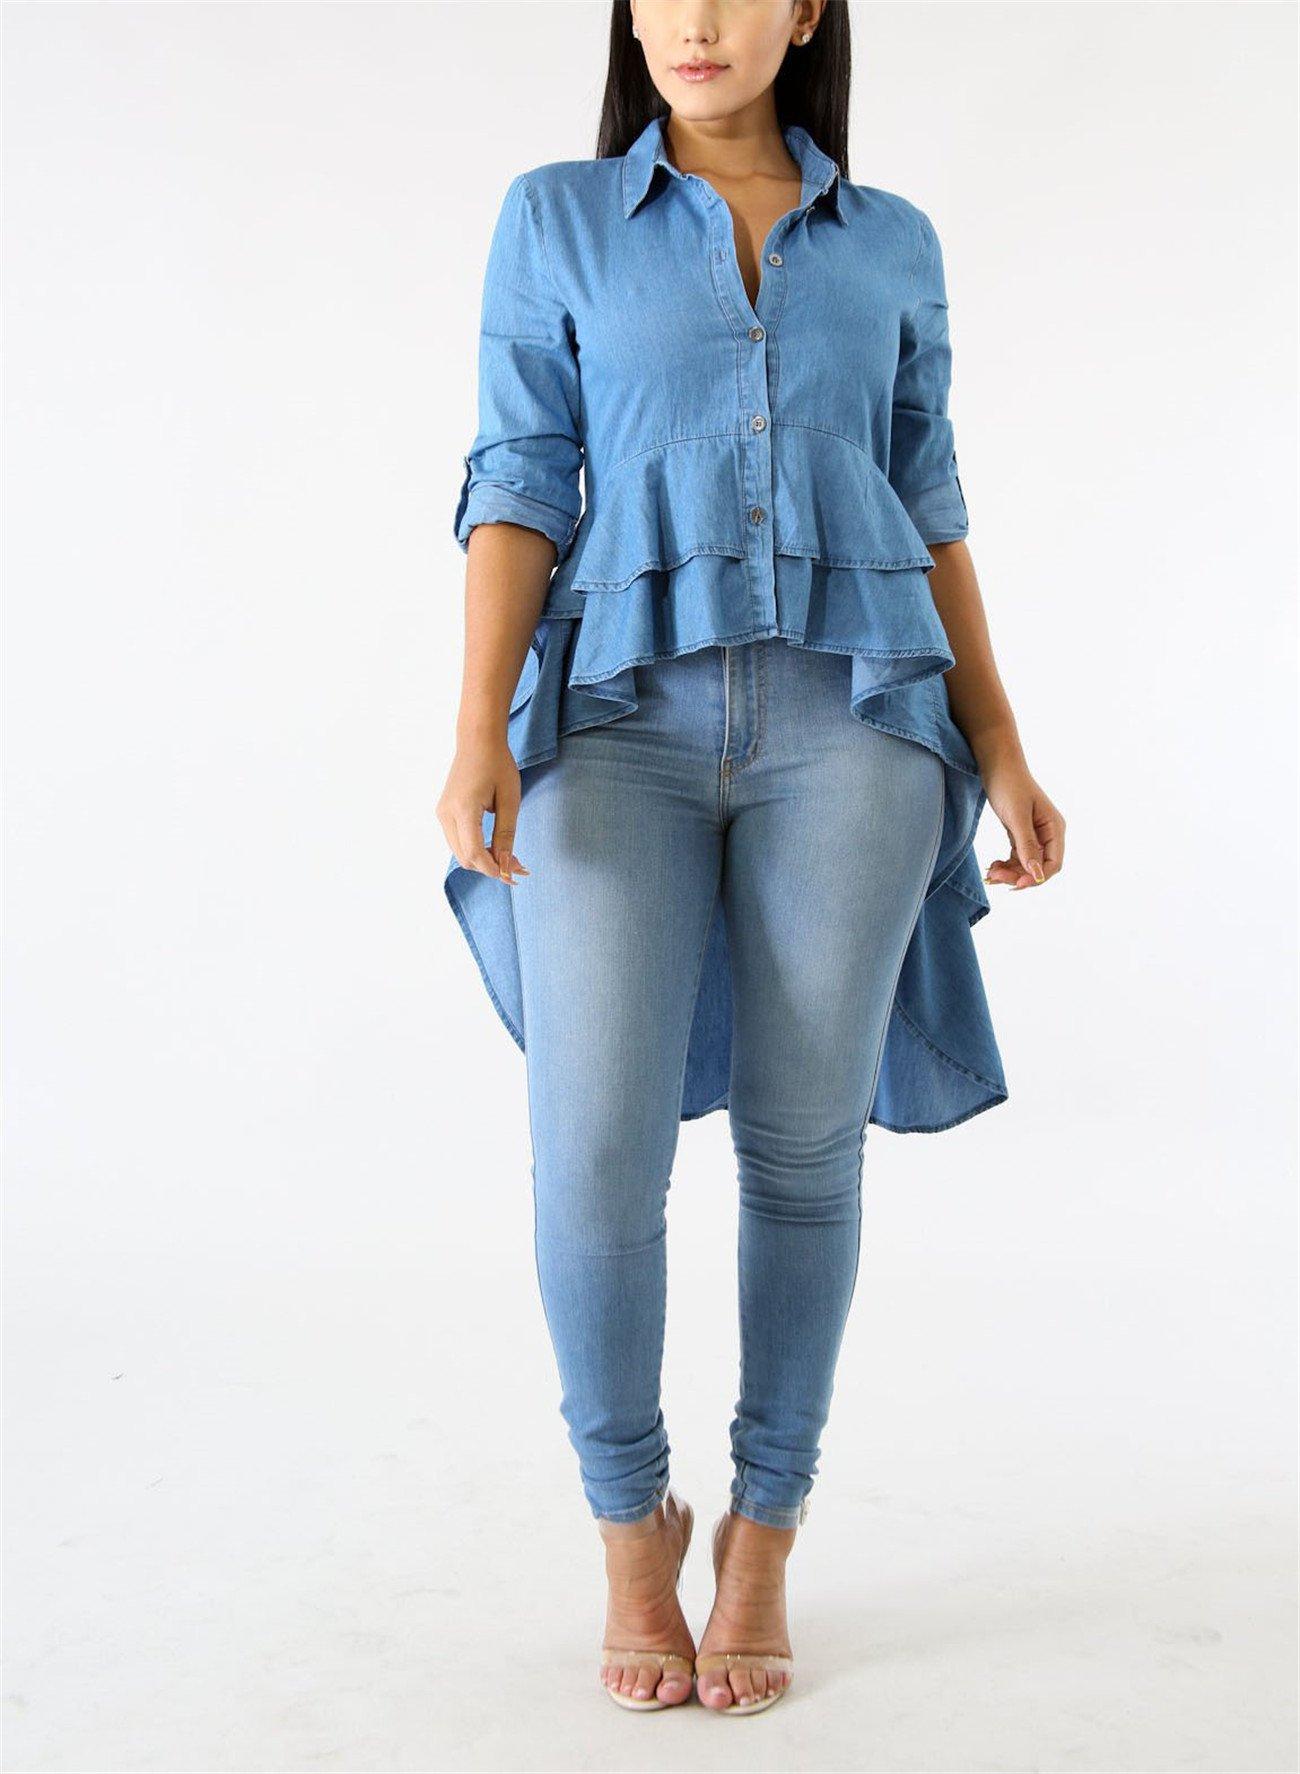 Fashion Cluster Womens Summer Long Sleeve Denim Blue Irregular High Low Hem Buttom Down Tunic Tops Blouse Boho Maxi Polo Shirt Dress XXL by Fashion Cluster (Image #3)